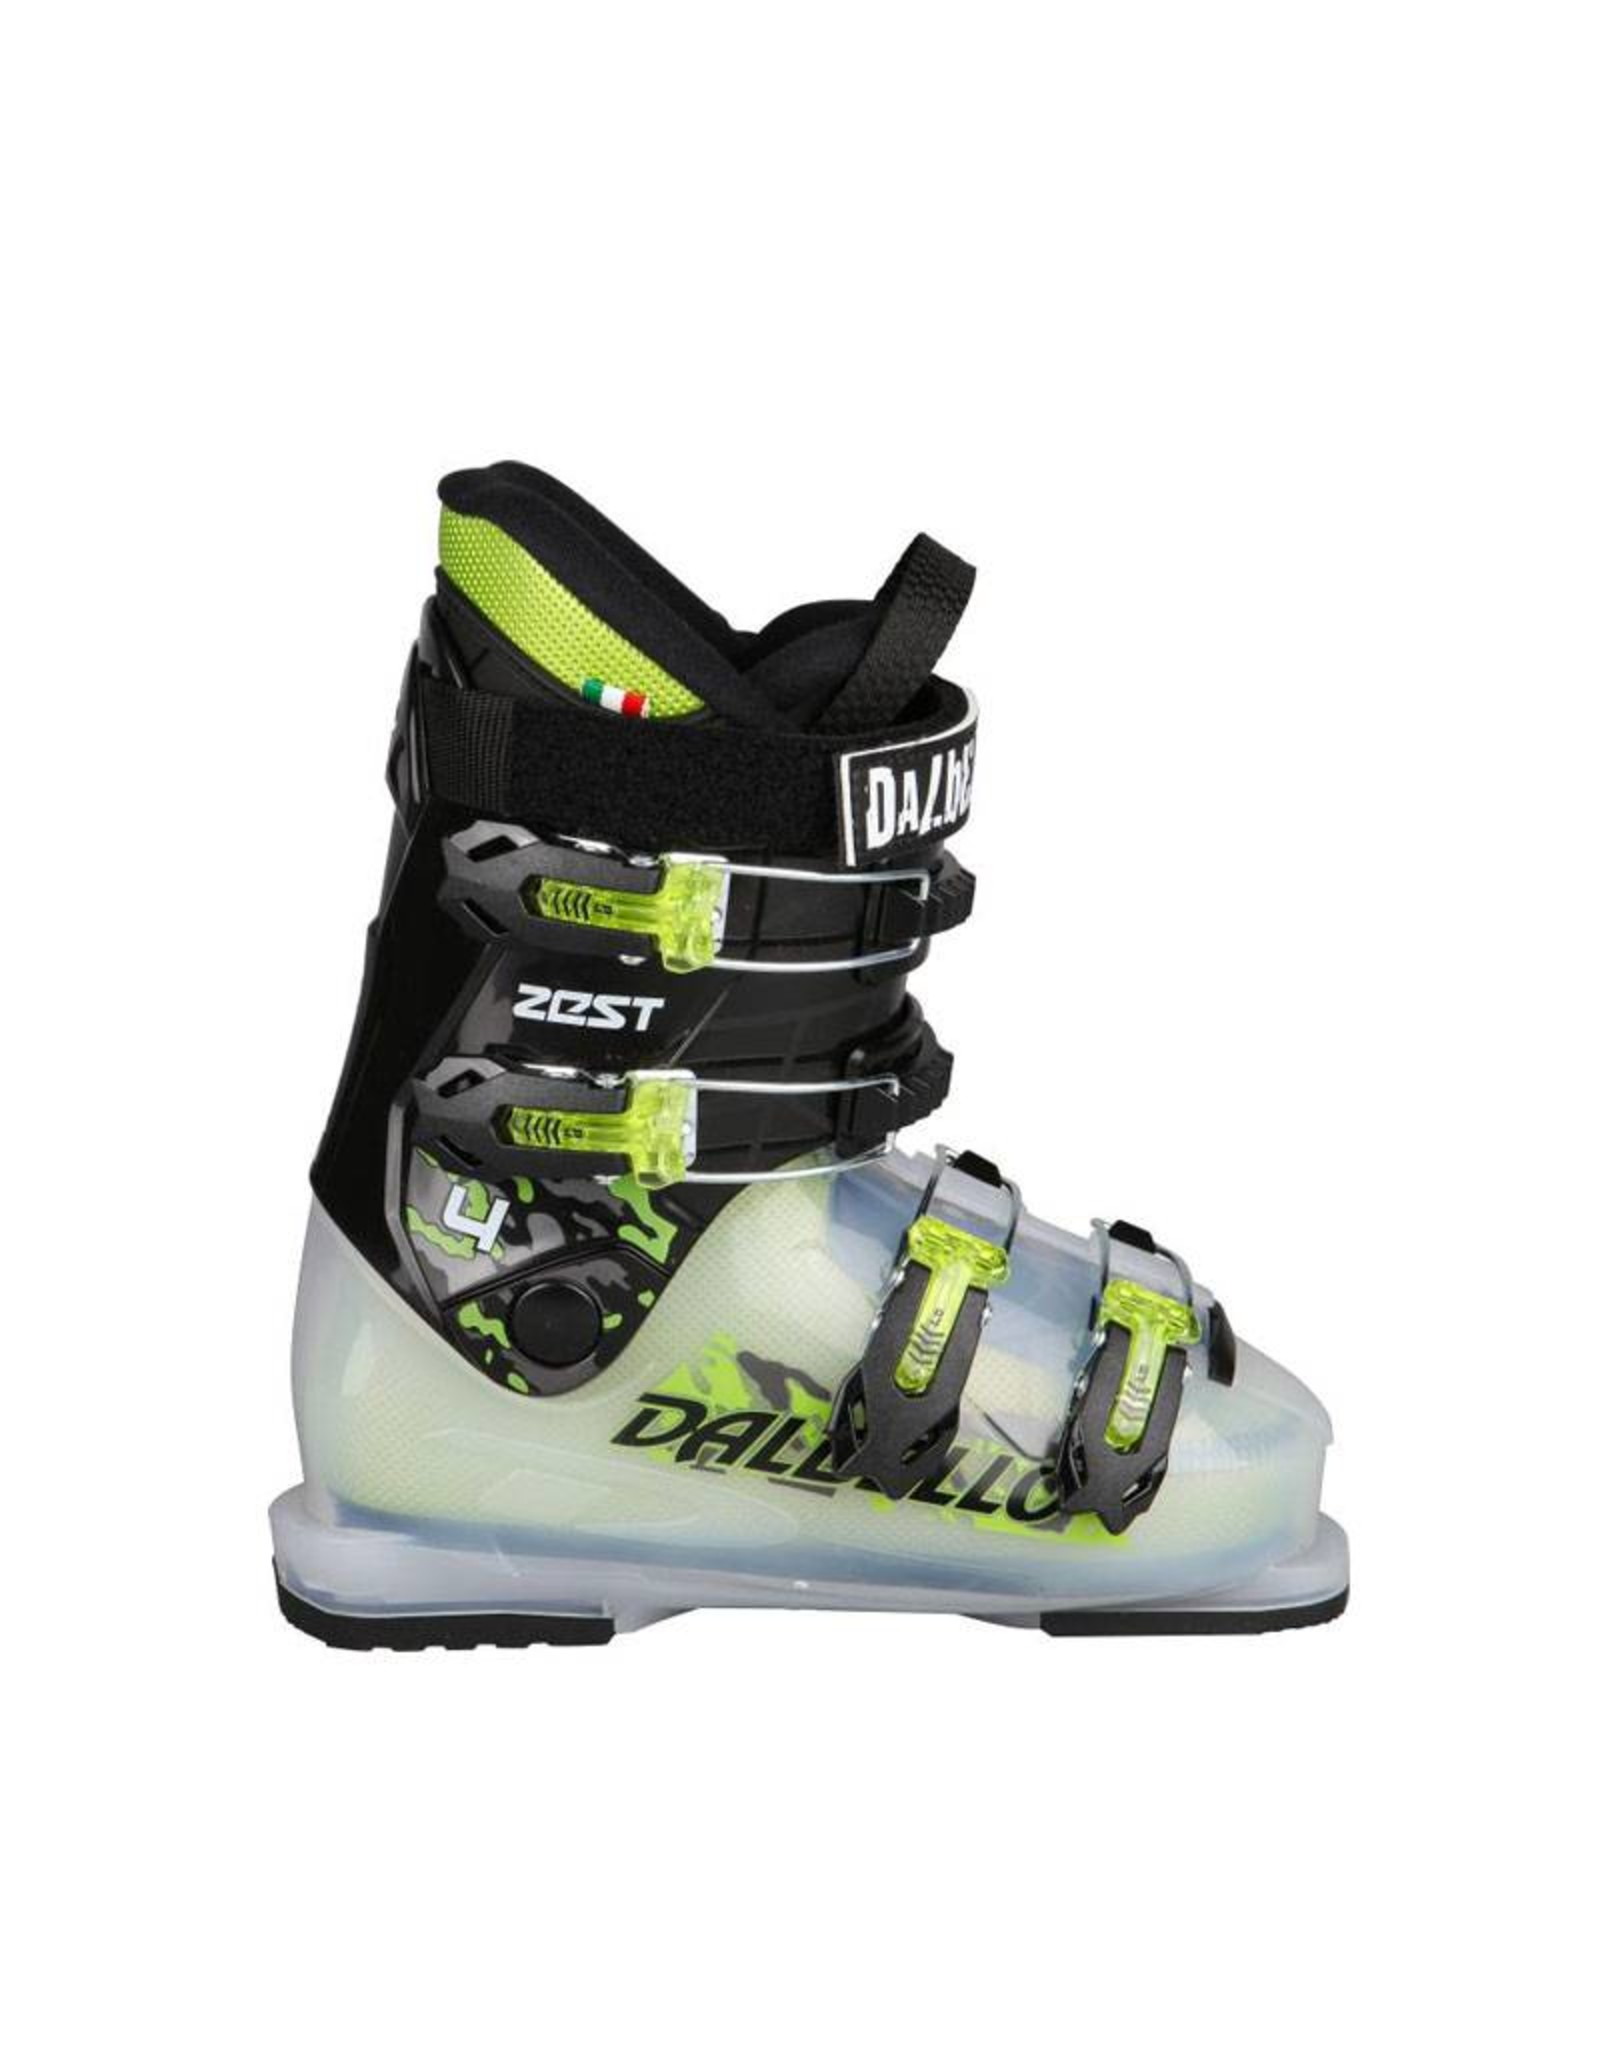 DALBELLO Skischoenen DALBELLO Zest Gebruikt (Zwart/Lime/Trans)